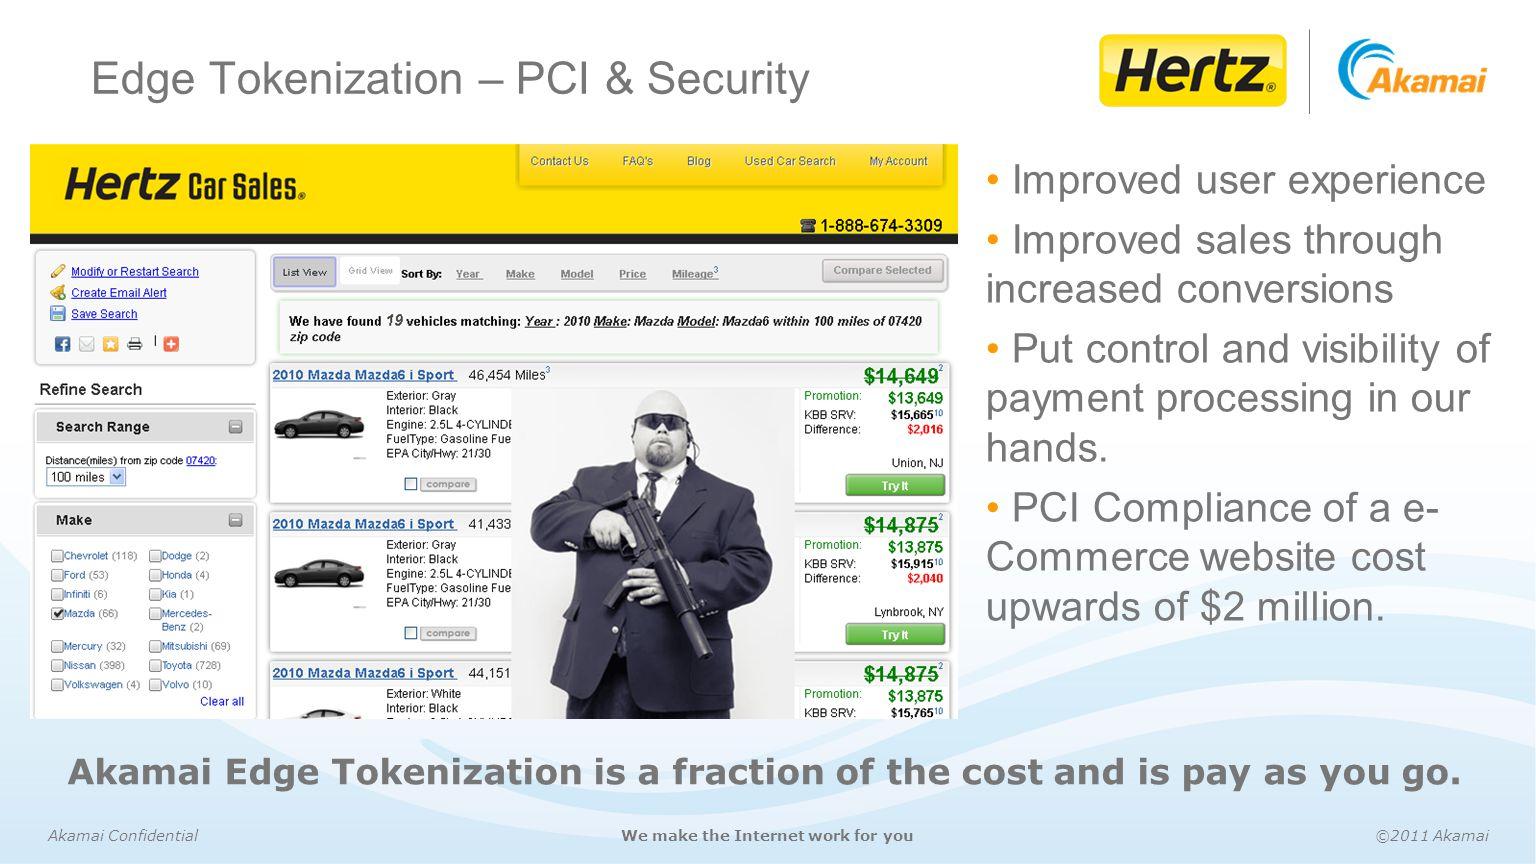 Edge Tokenization – PCI & Security